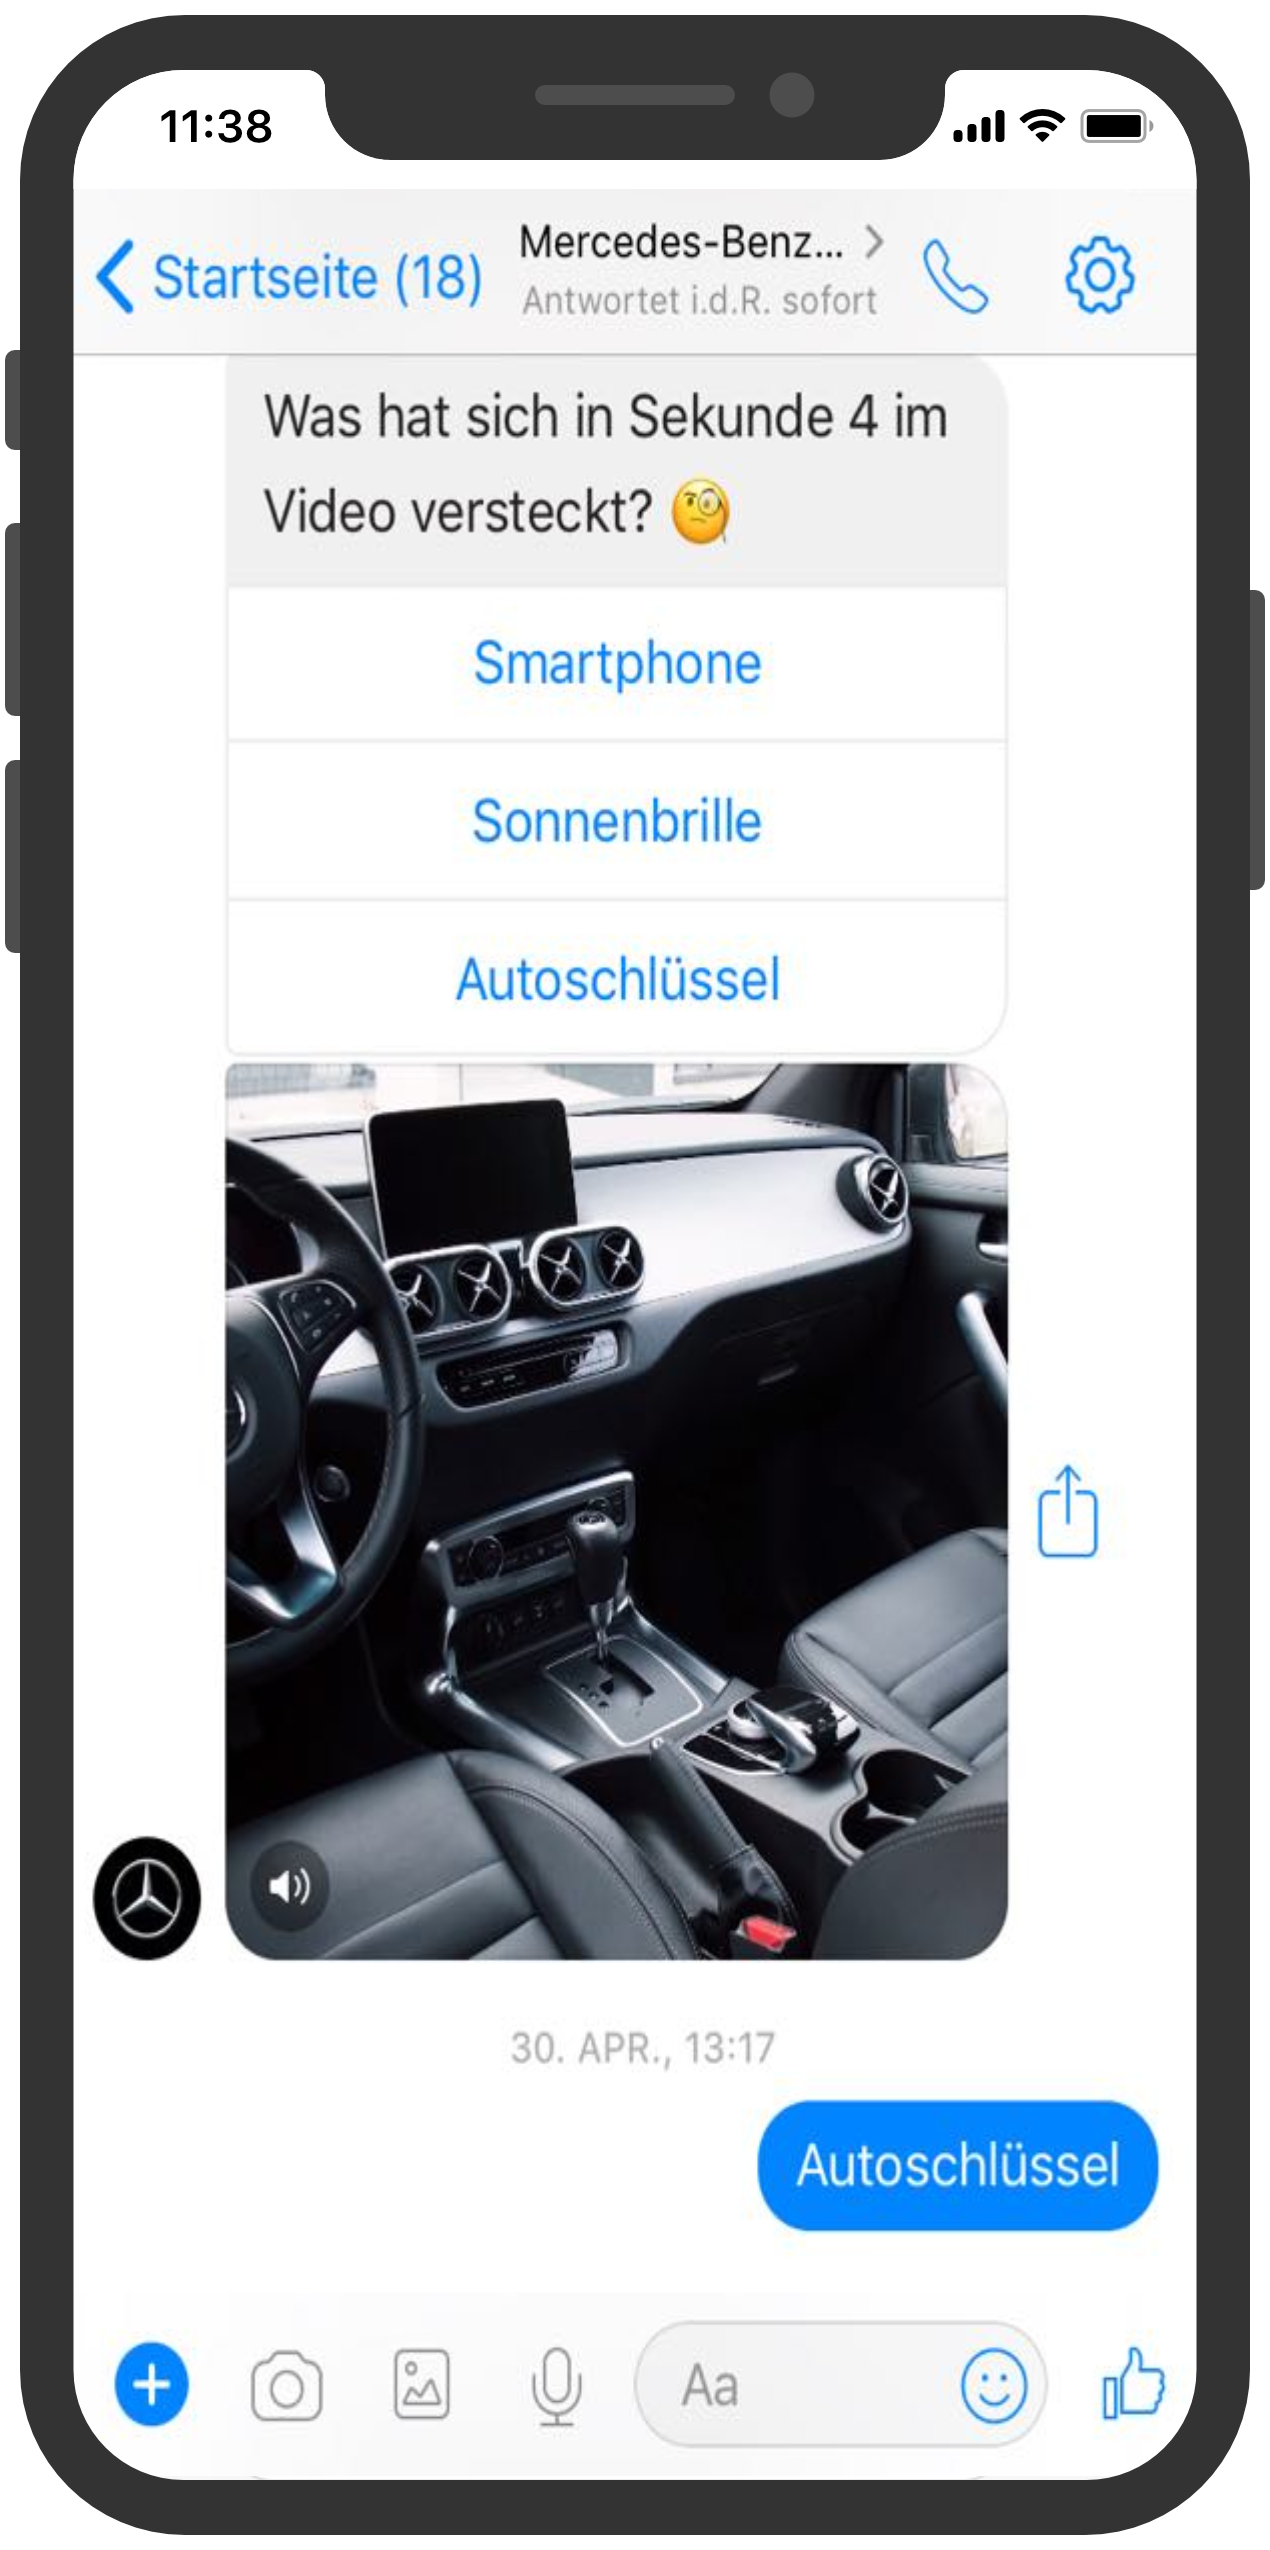 Mercedes benz schnitzeljagt chatbot